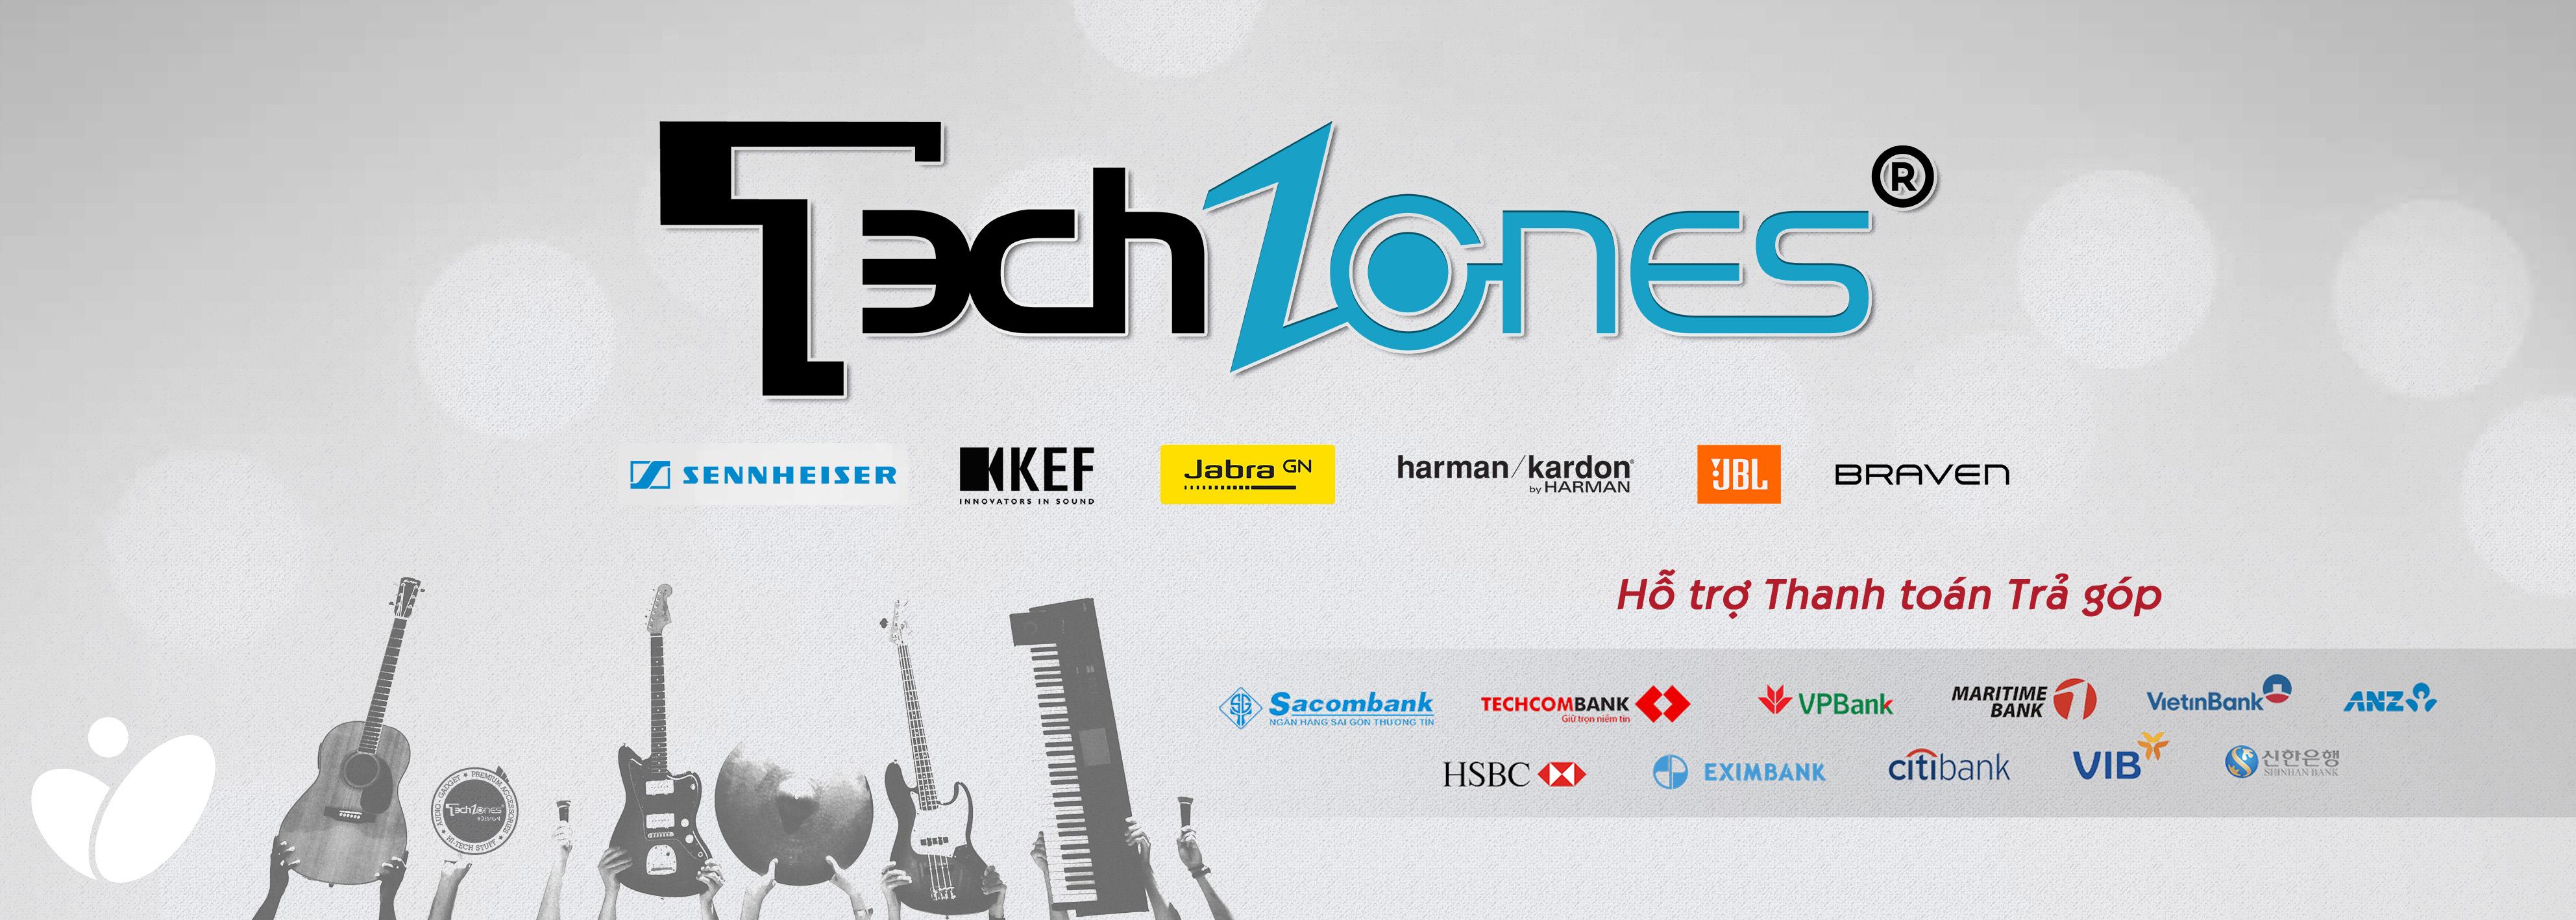 Banner Techzones.jpg